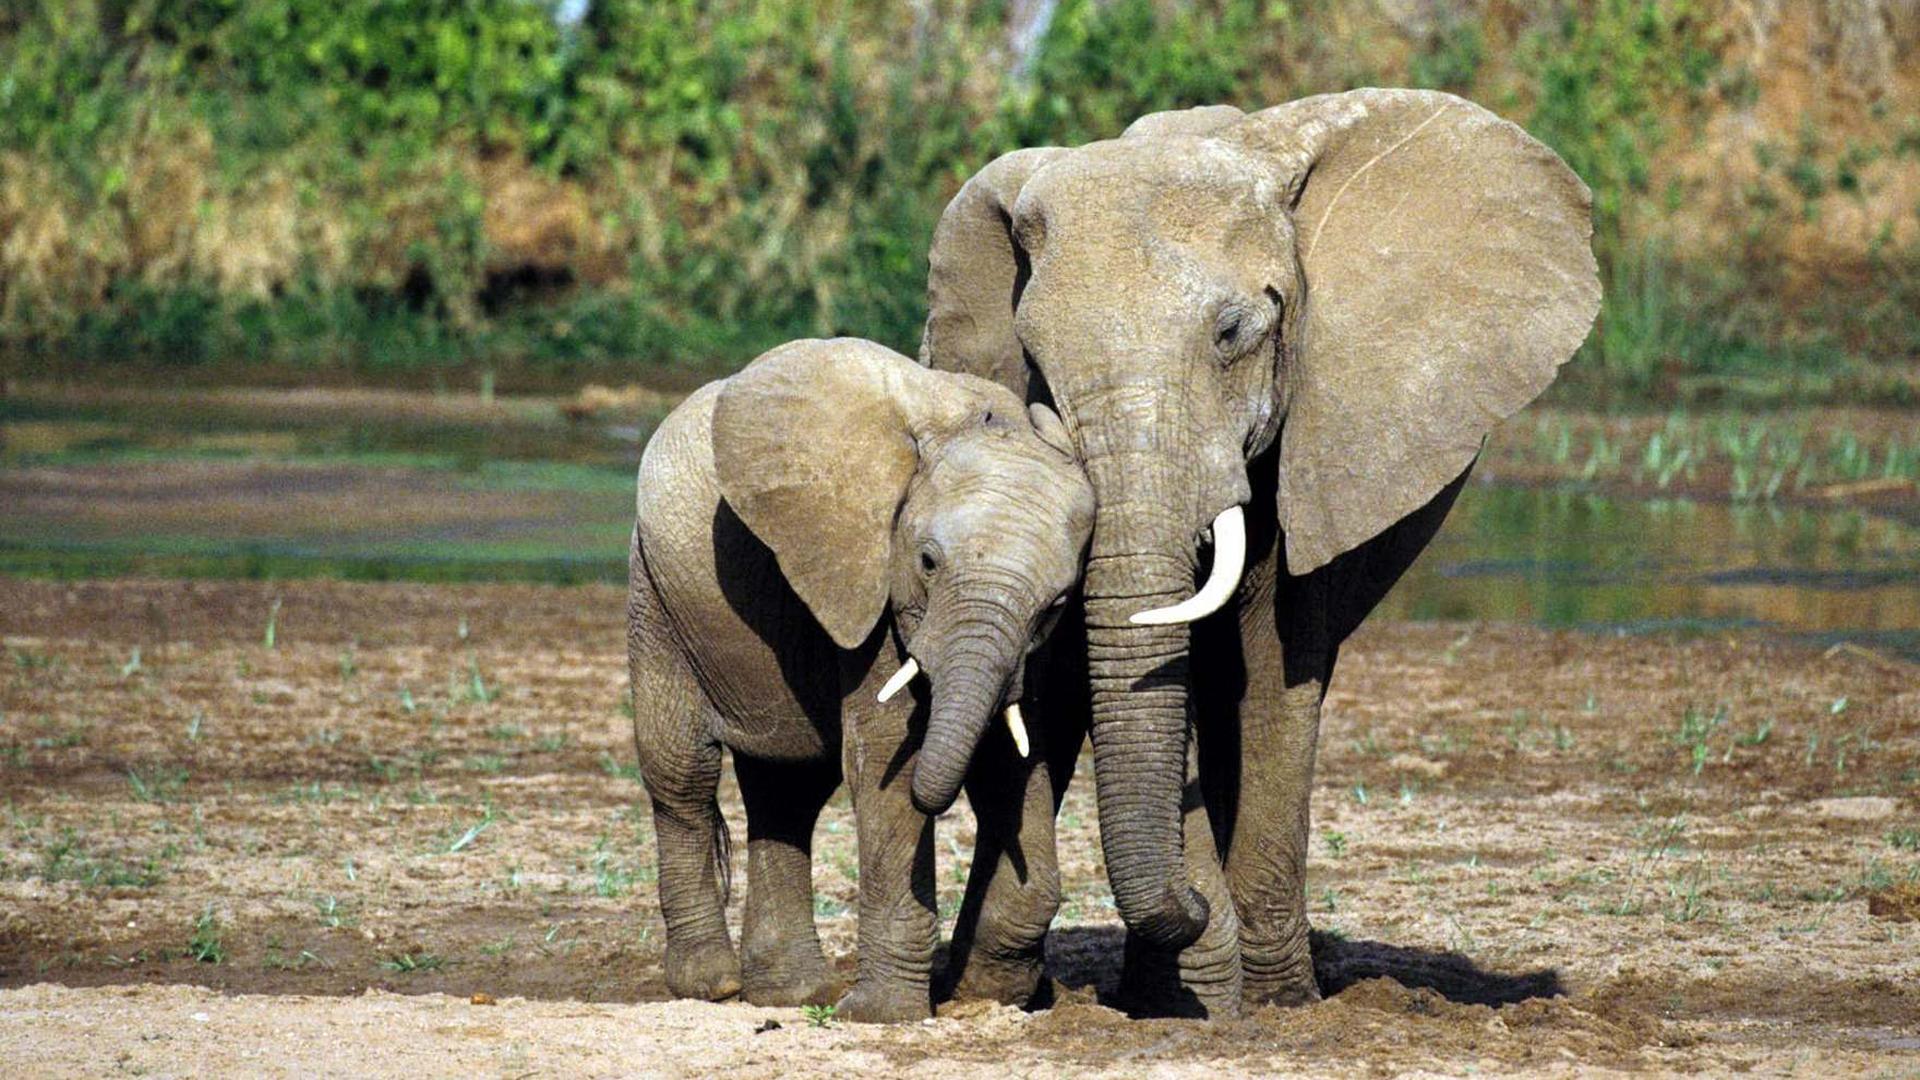 Elephant Wallpapers